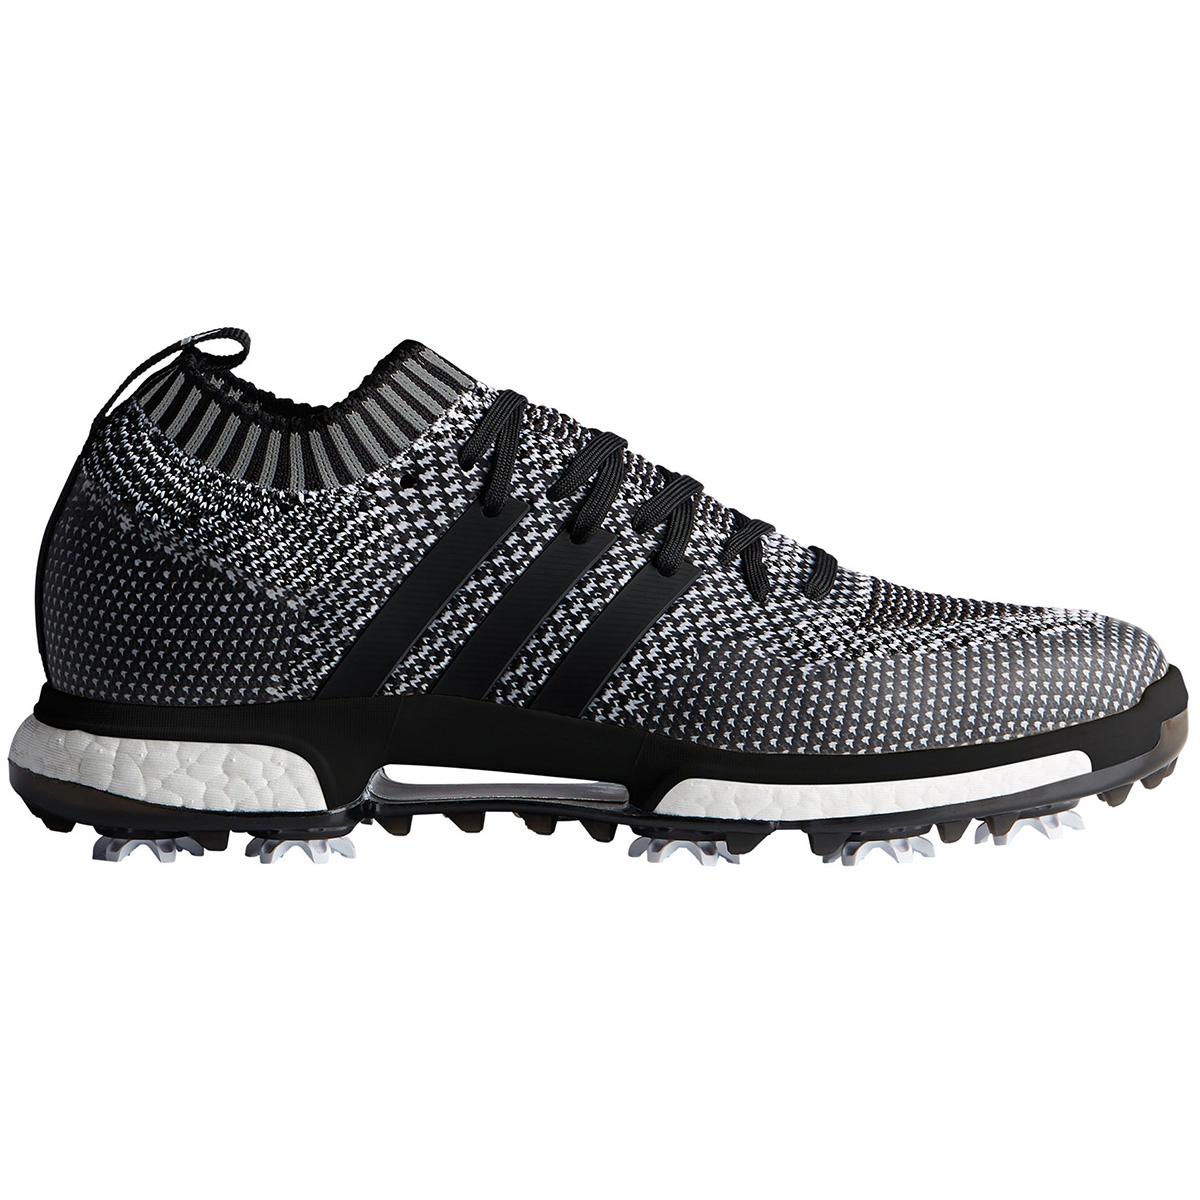 adidas Golf Tour360 Knit Shoes | Online